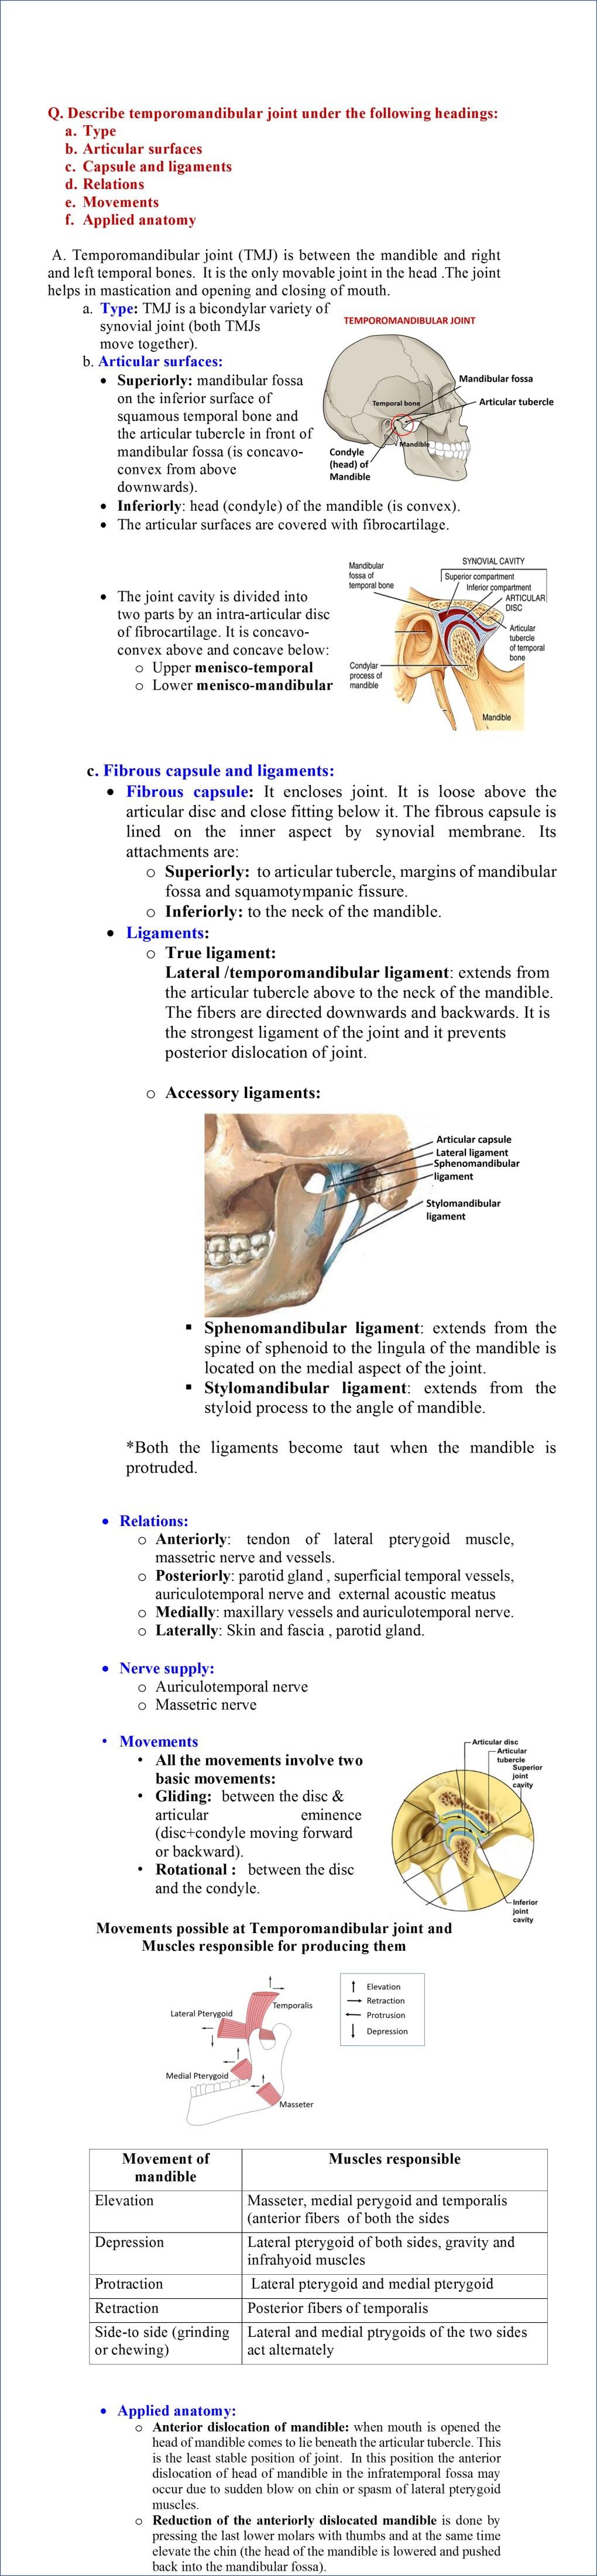 Temporomandibular joint -anatomy